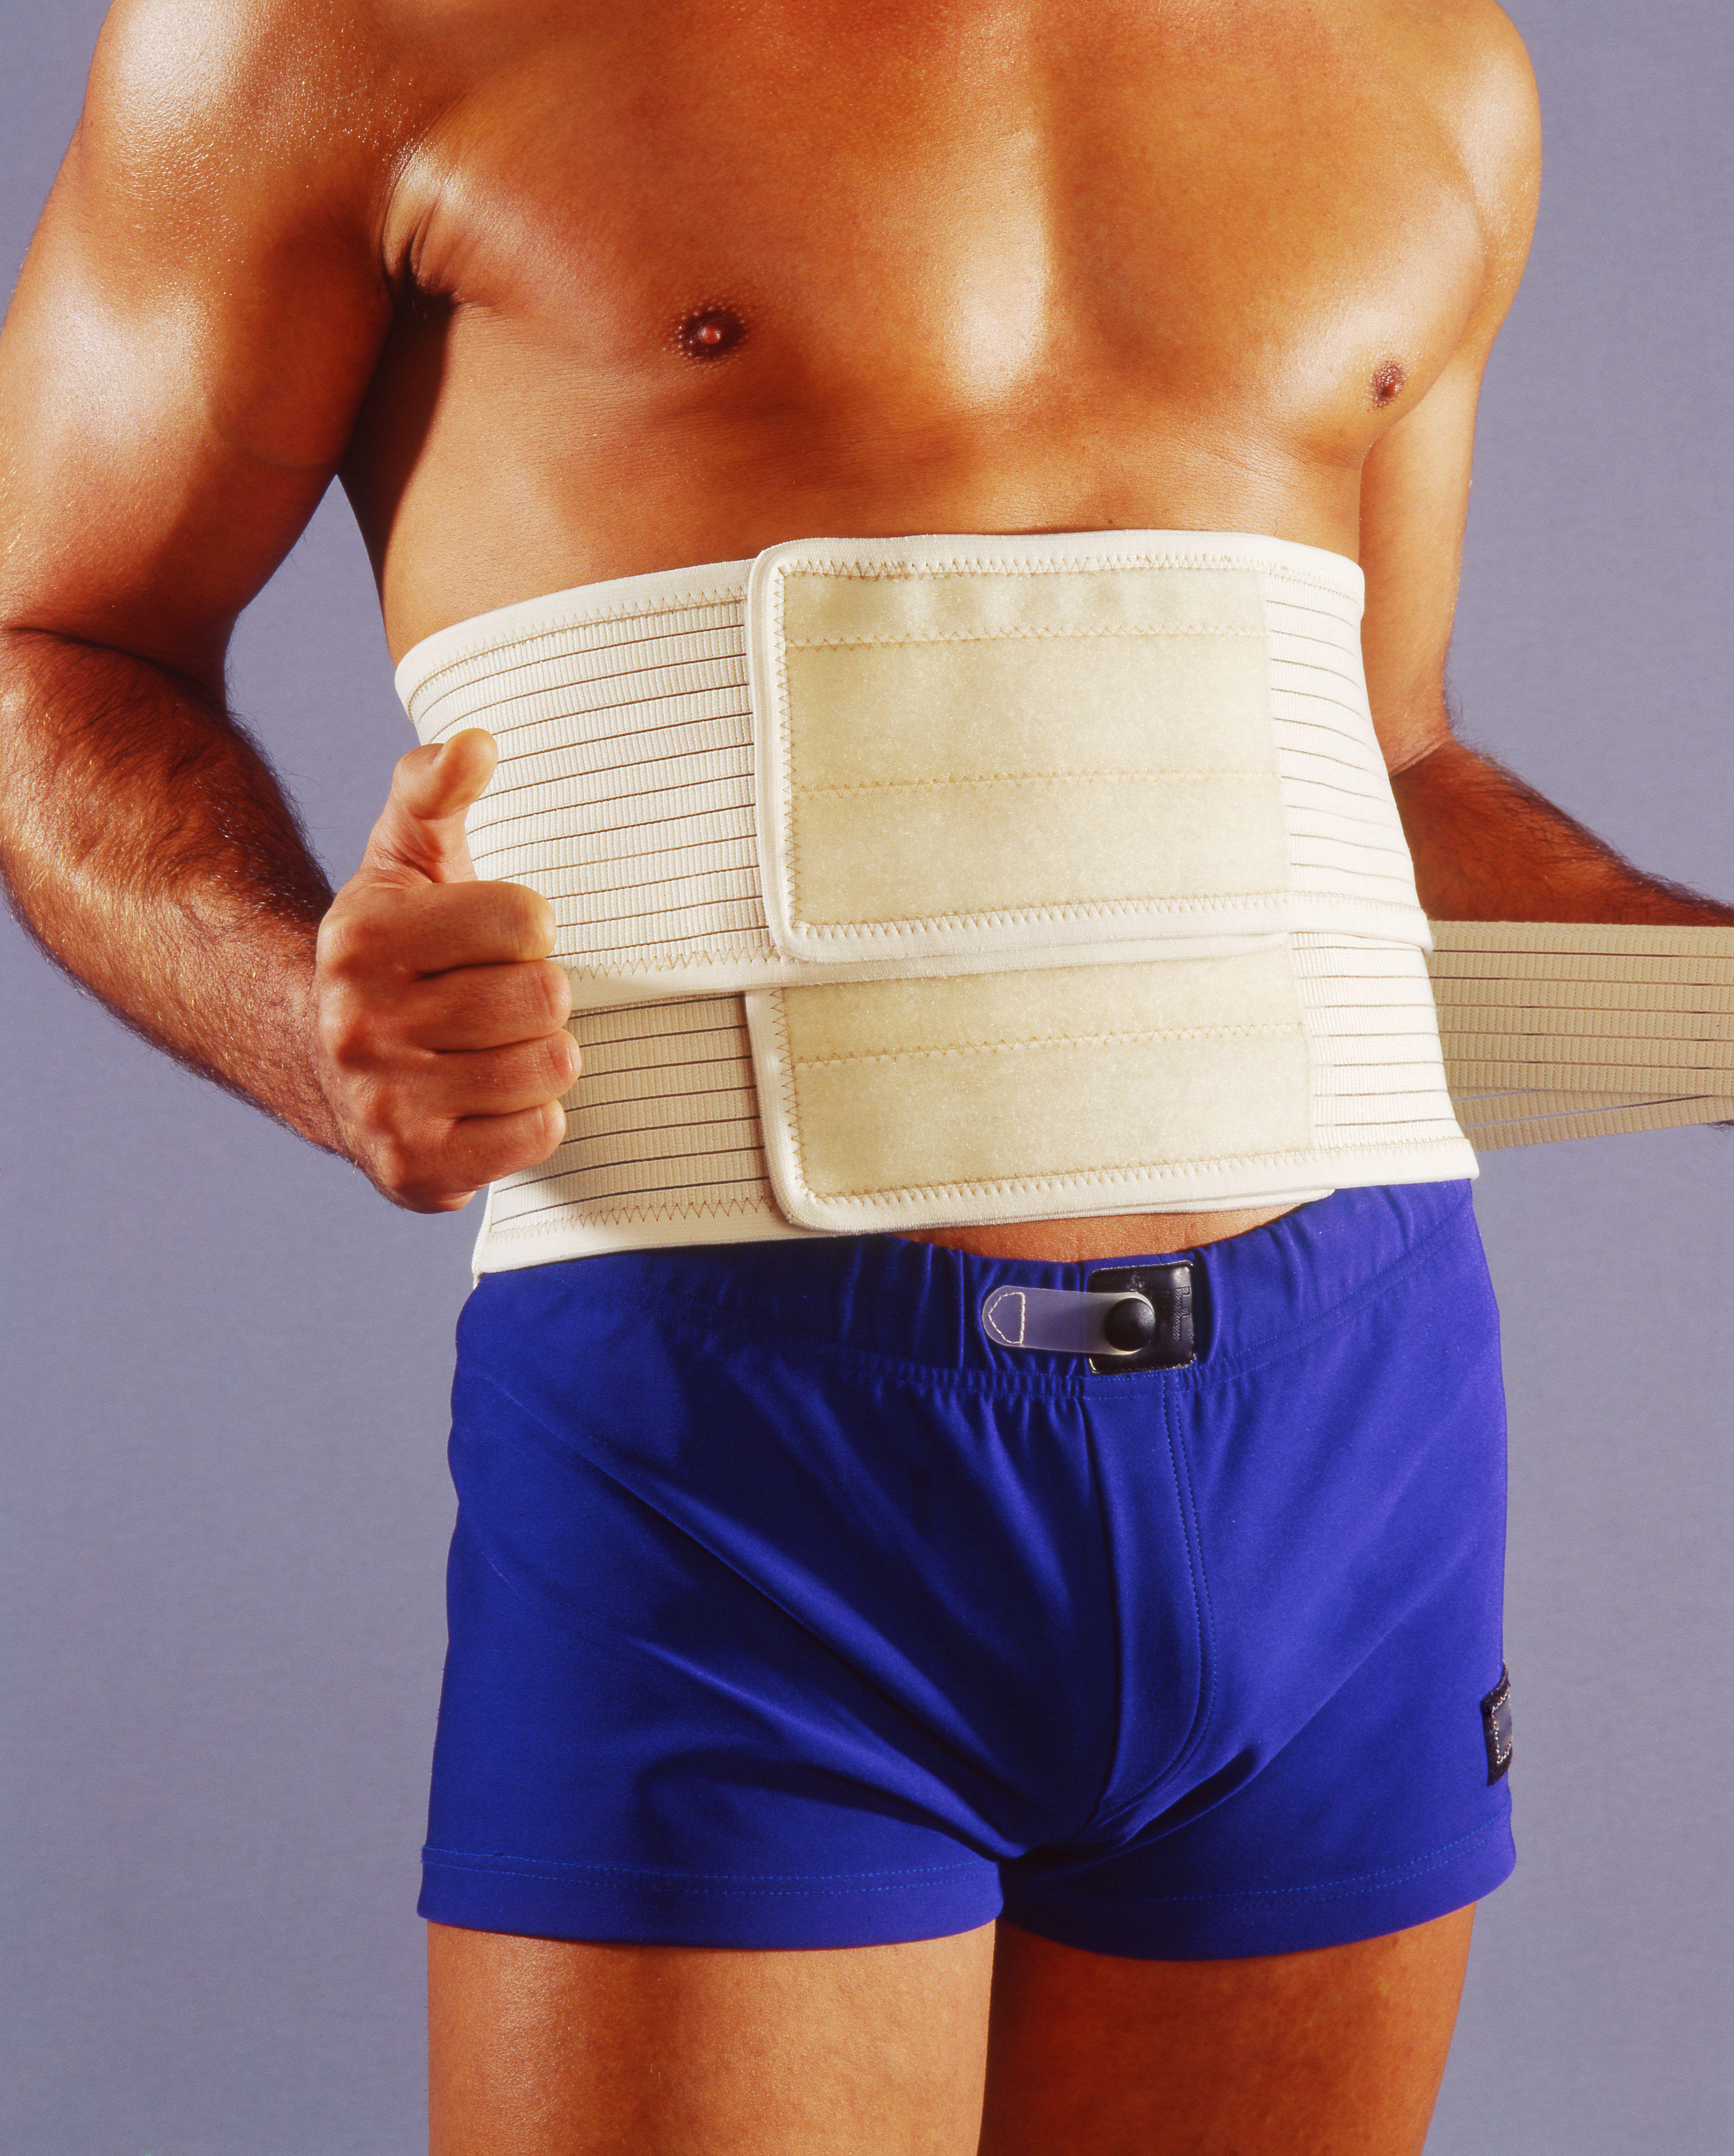 Presoterapia: Productos de Ortopedia Velásquez